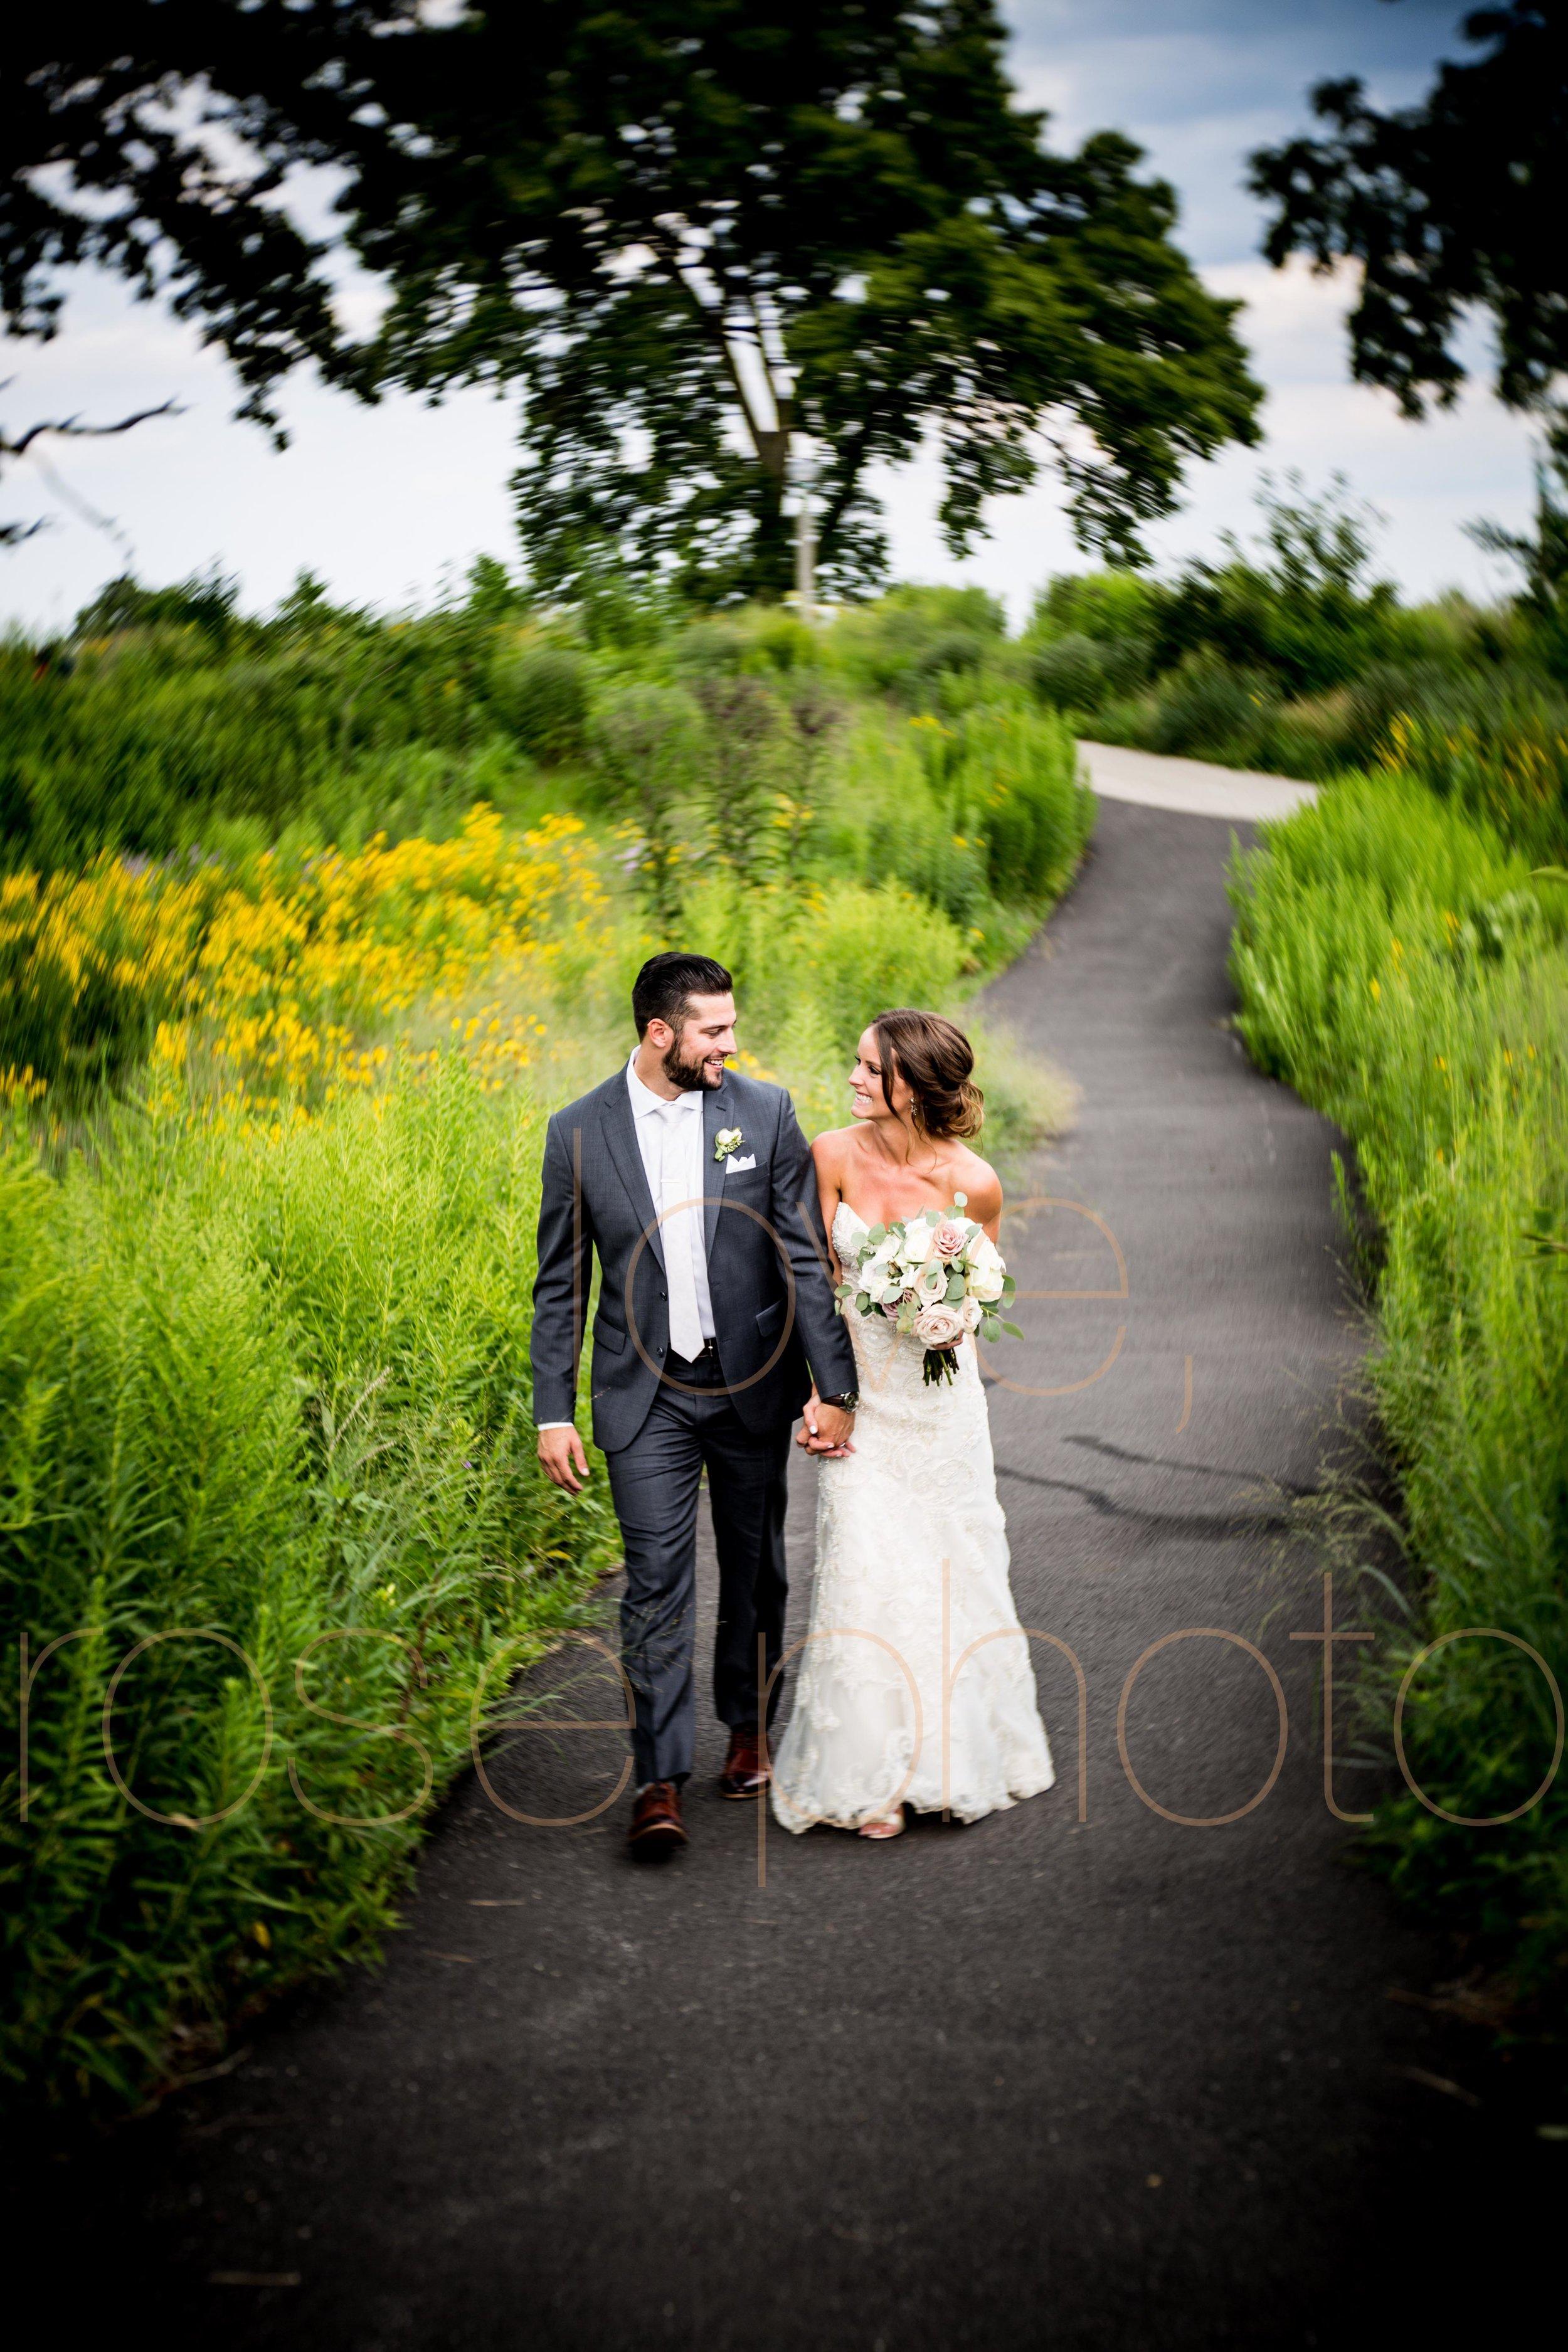 Justine + Matt big day downtown Chicago River Roast wedding by Rose Photo-23.jpg